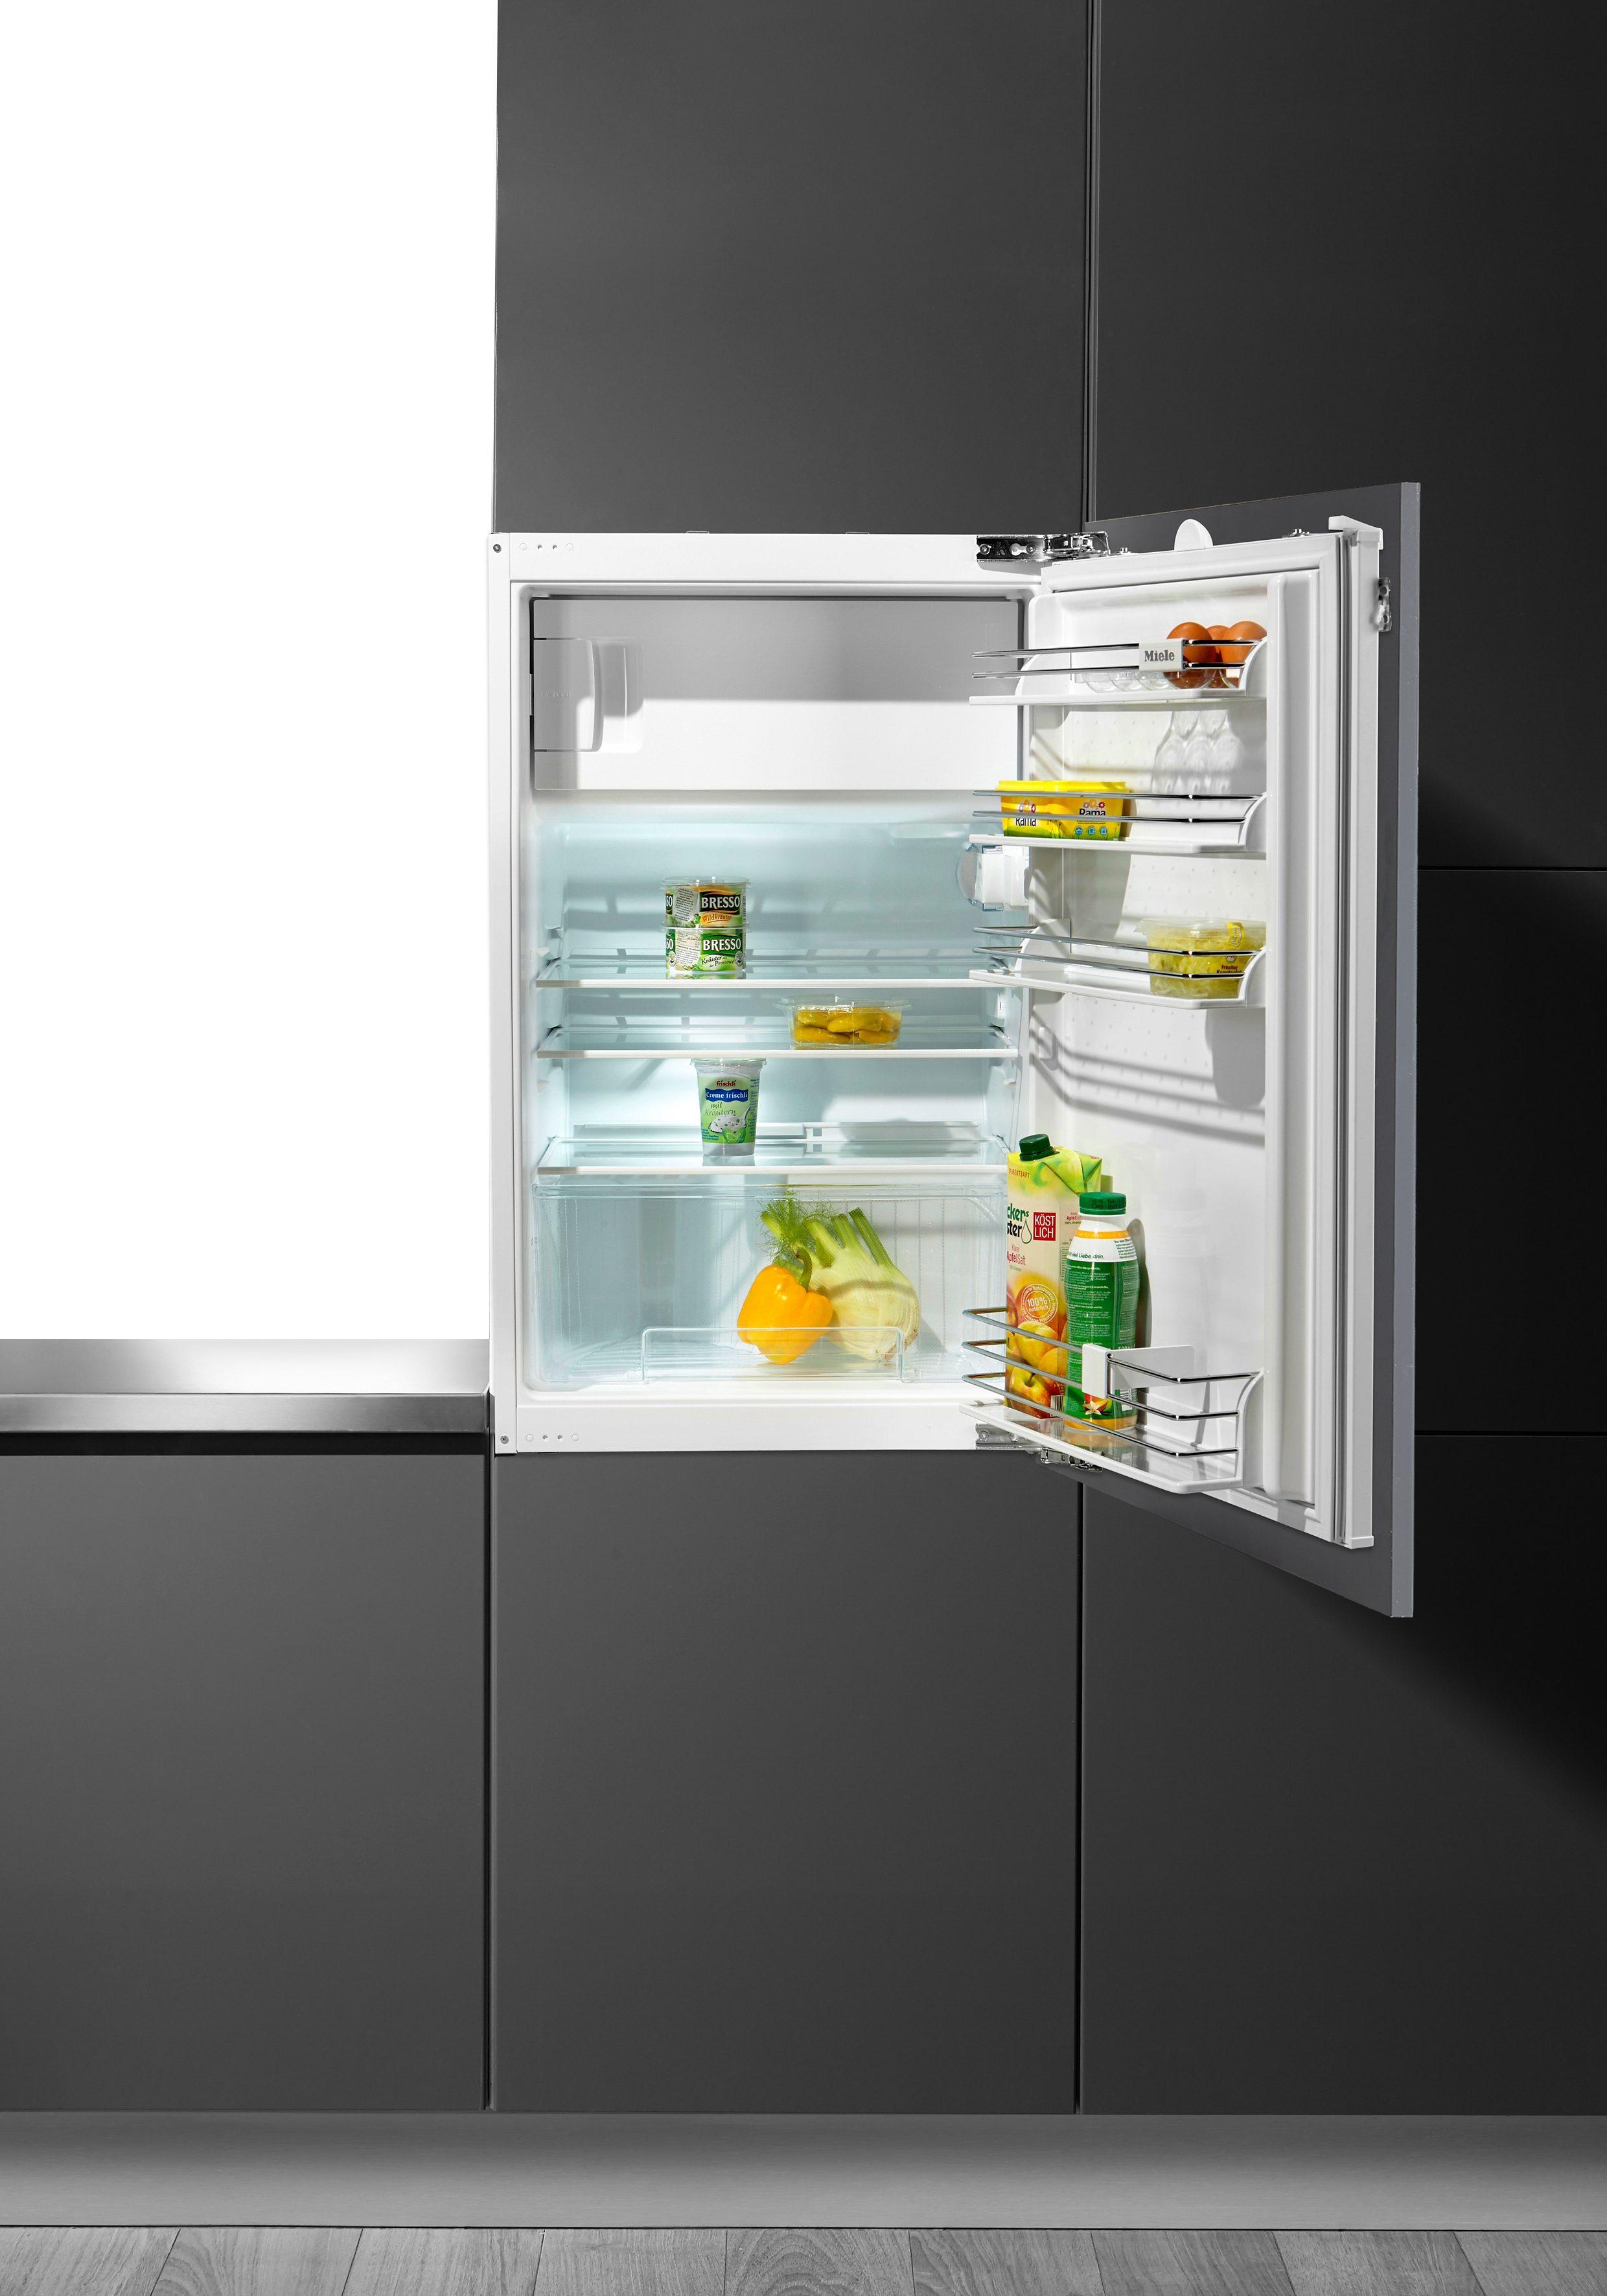 Miele integrierbarer Einbau-Kühlautomat K 5224 iF-1, A+++, 87,4 cm